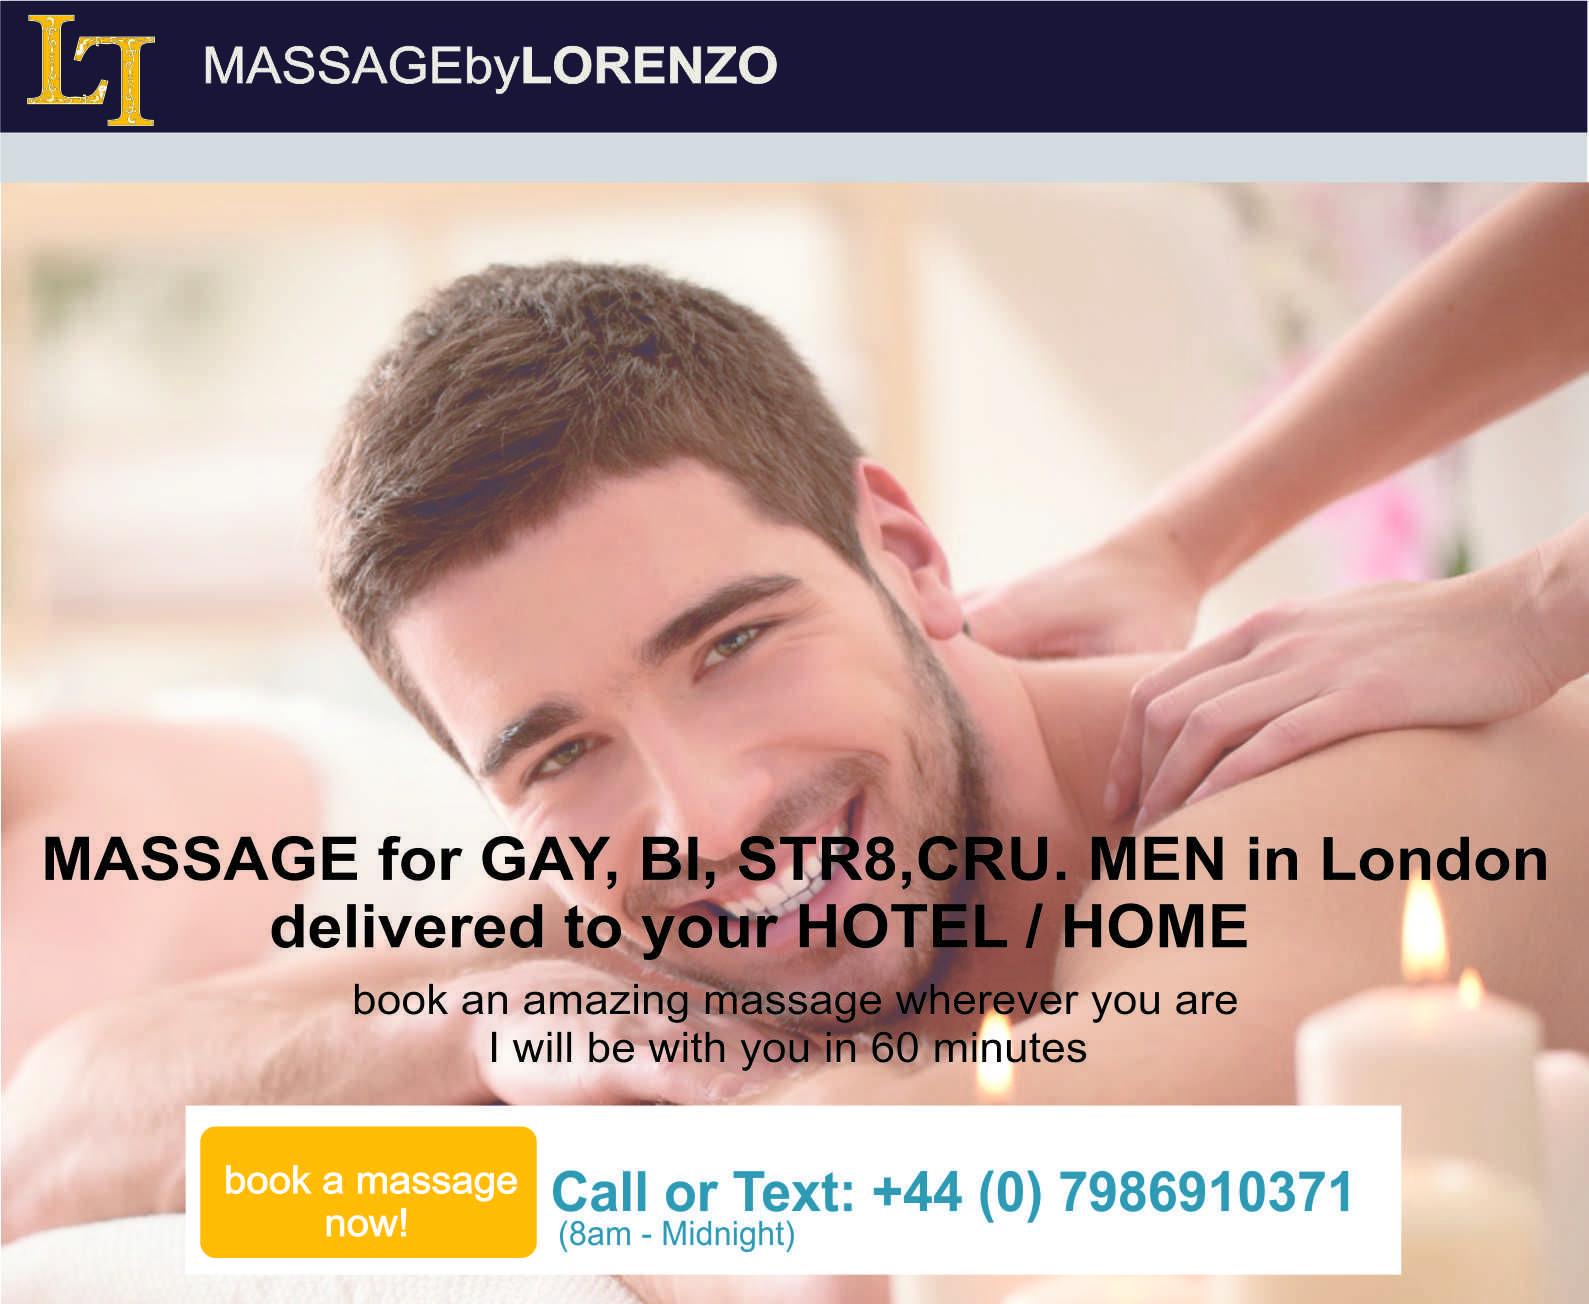 Gay therapudic massage